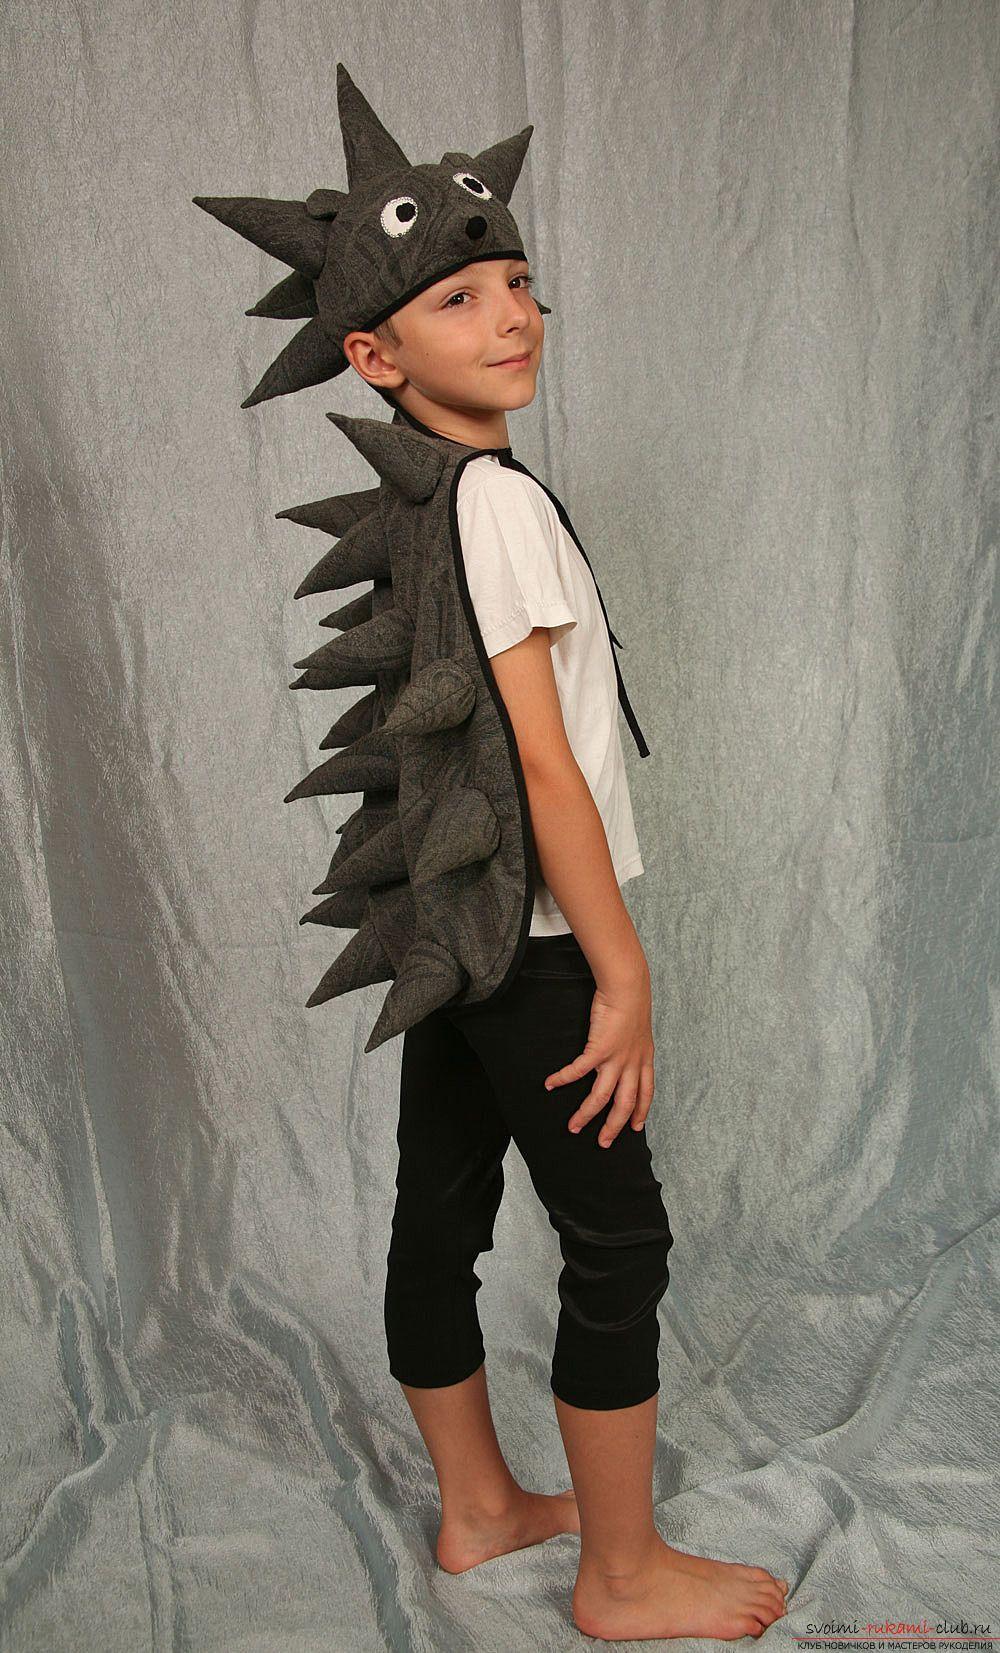 Новогодний костюм ежика для мальчика своими руками фото 66